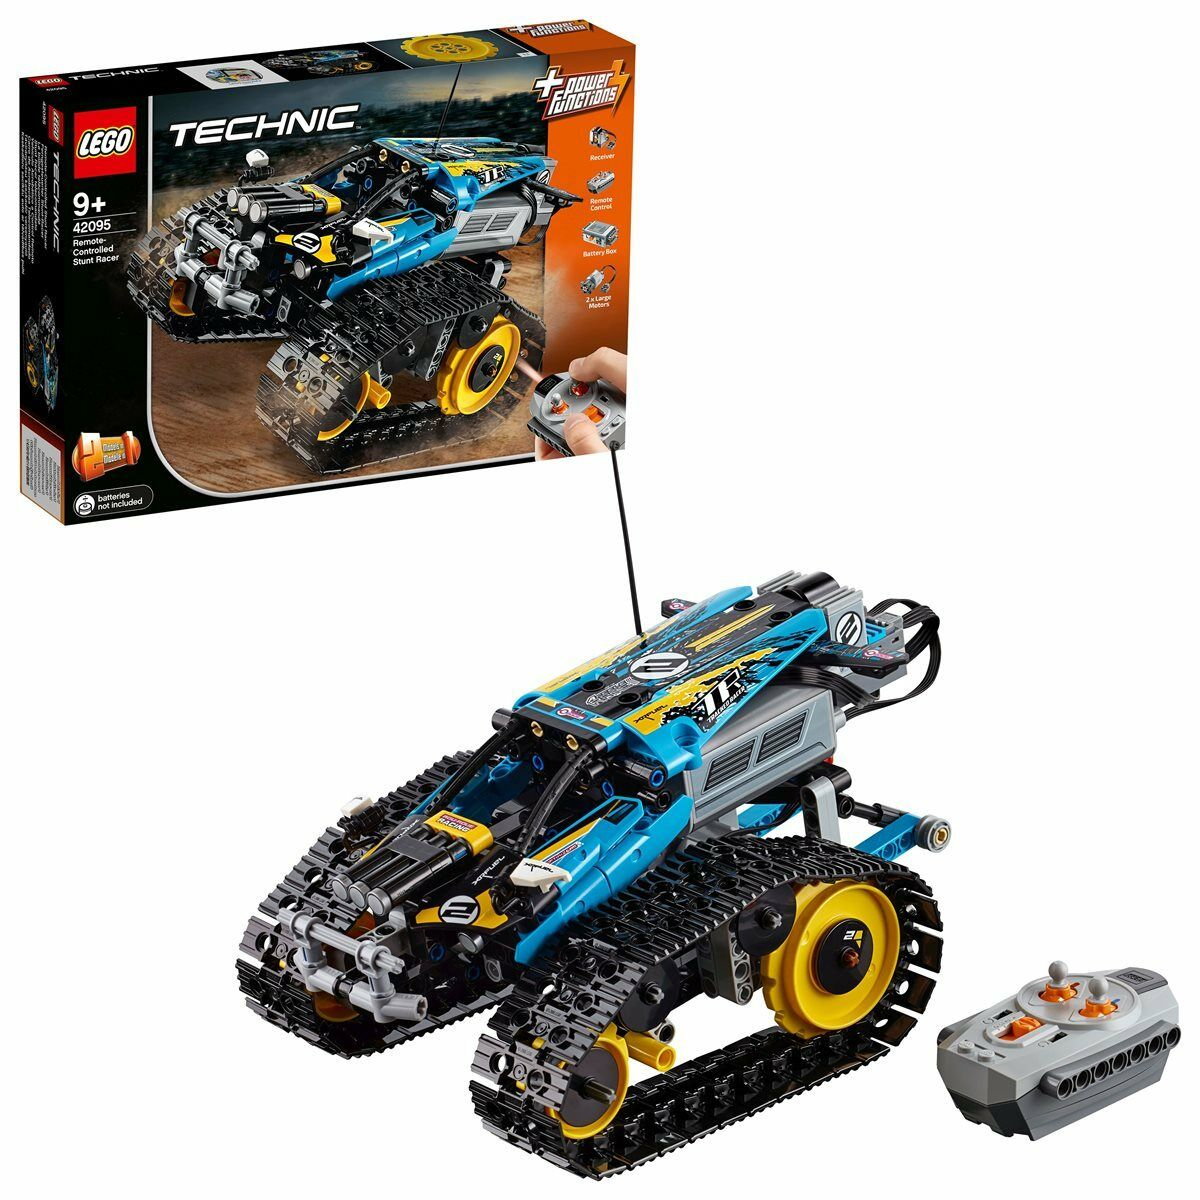 LEGO® Technic 42095 Ferngesteuerter Stunt-Racer 324 Teile Neuheit 2019 Ovp